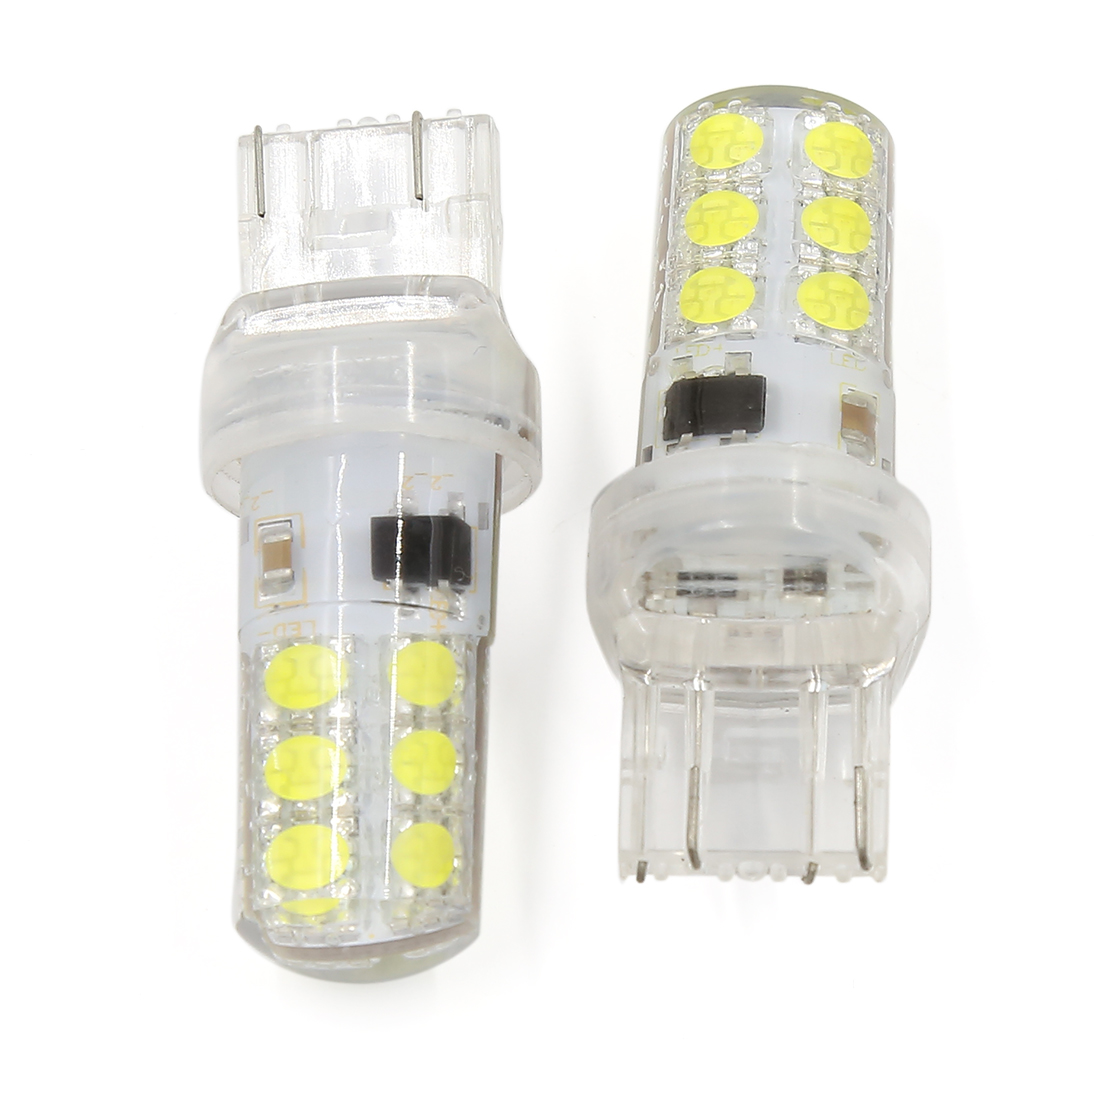 2 Pcs Silicone 7443 7440 White 12-LED Backup Reverse Light Brake Lamp Bulb 12V